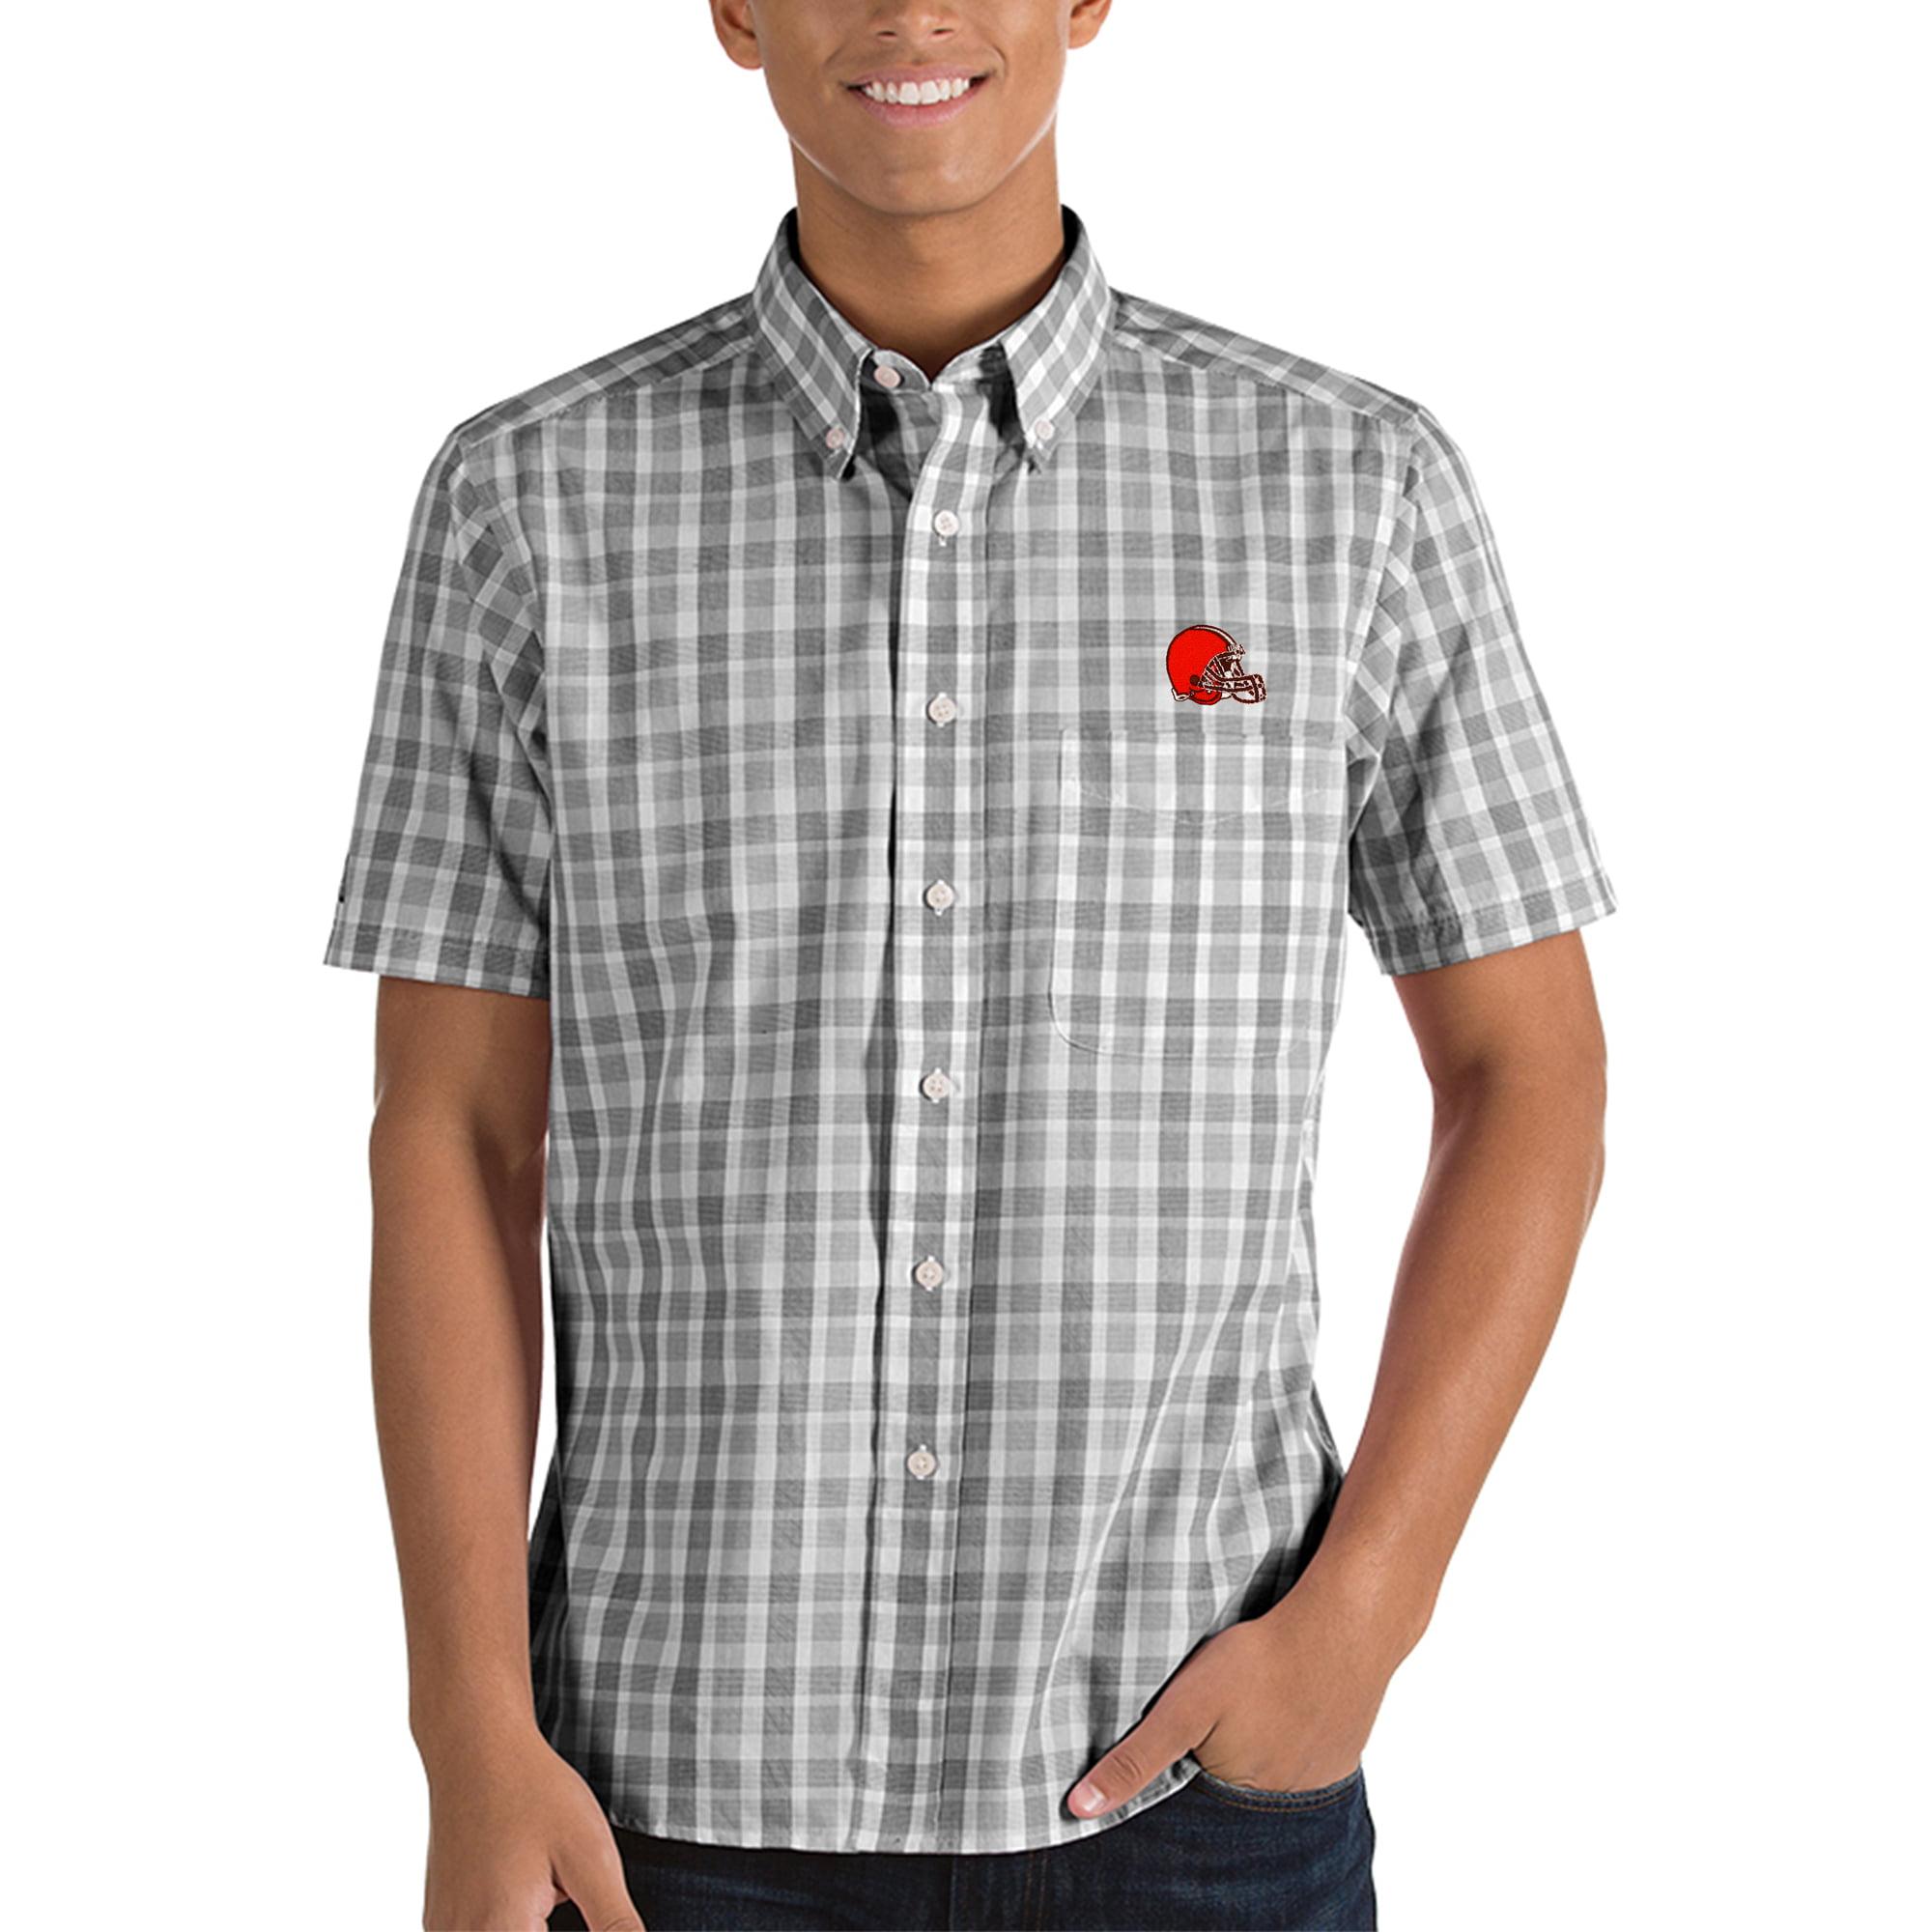 Cleveland Browns Antigua Crew Woven Button-Down Shirt - Black/White